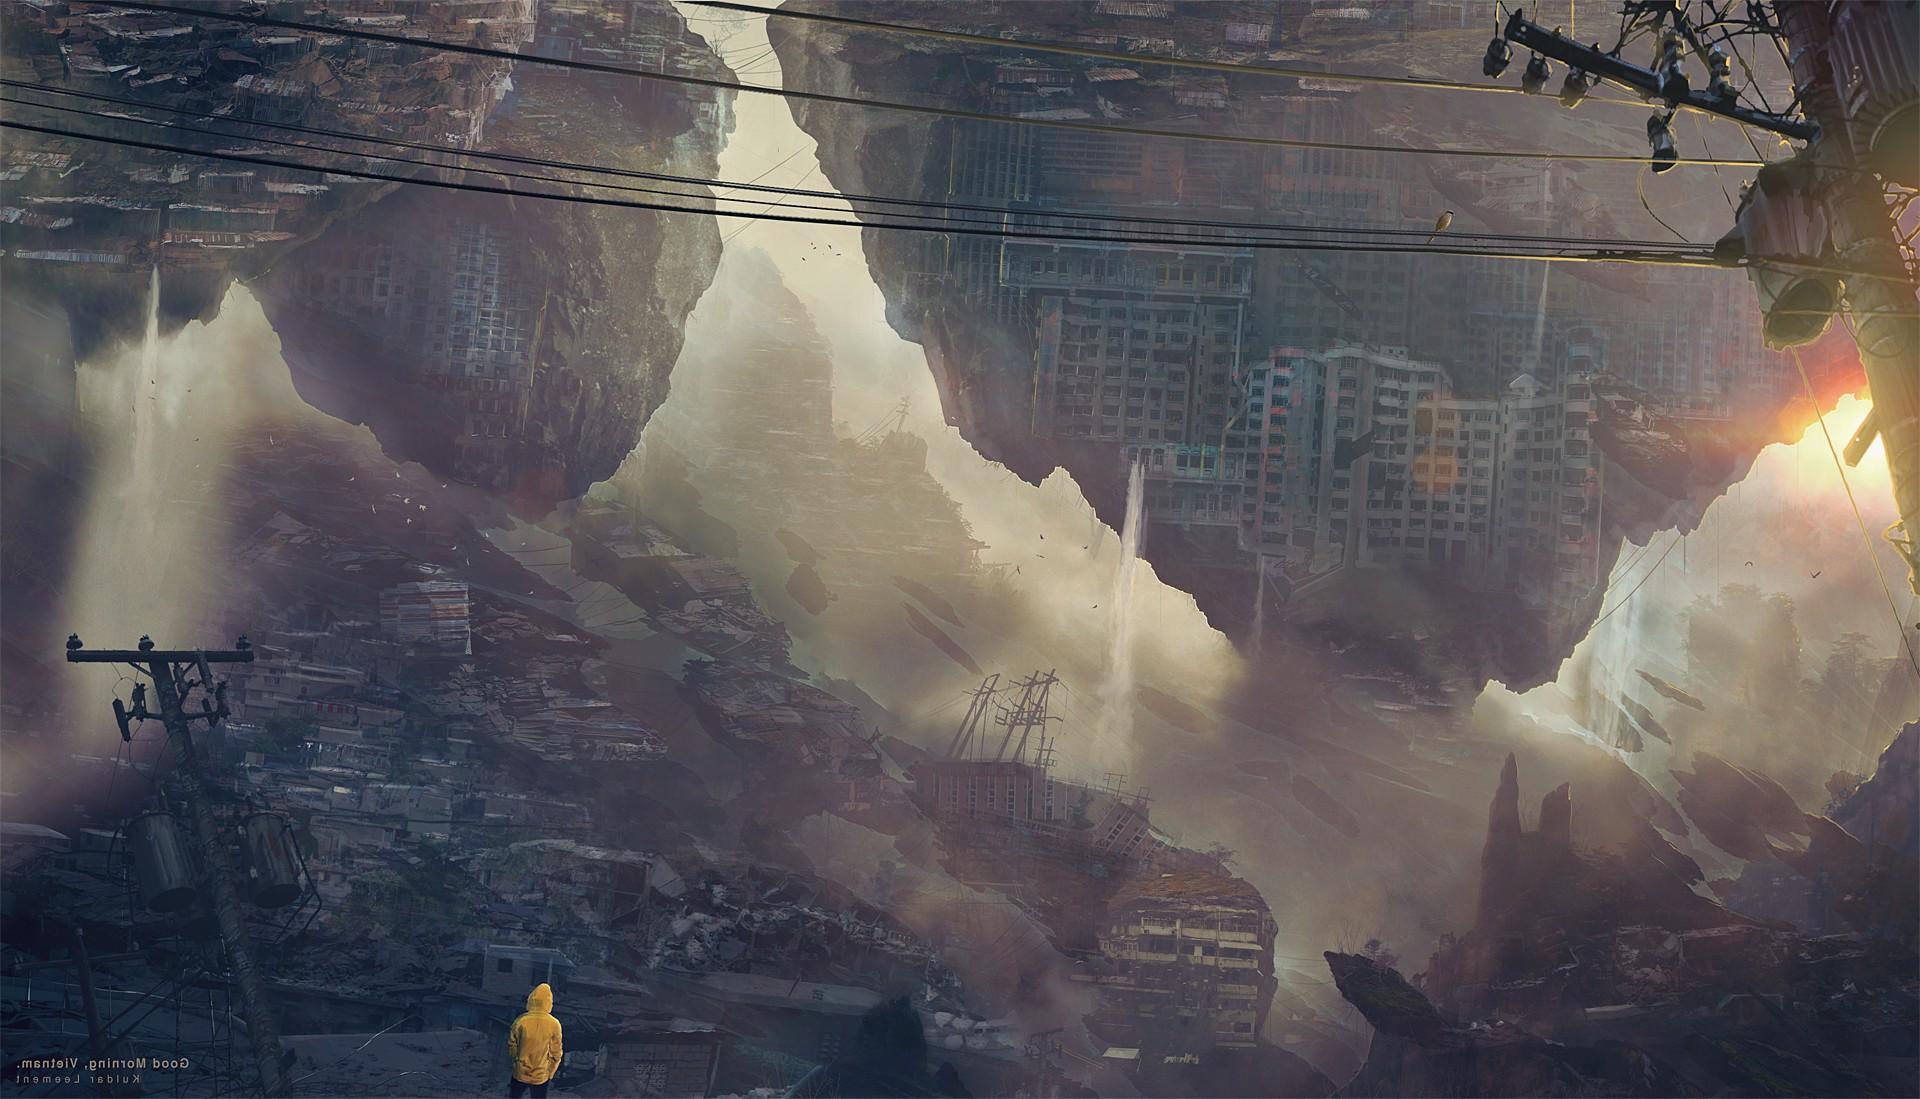 Desktop Wallpaper Fall Out Artwork Apocalyptic Cityscape Morning Anime Kuldar